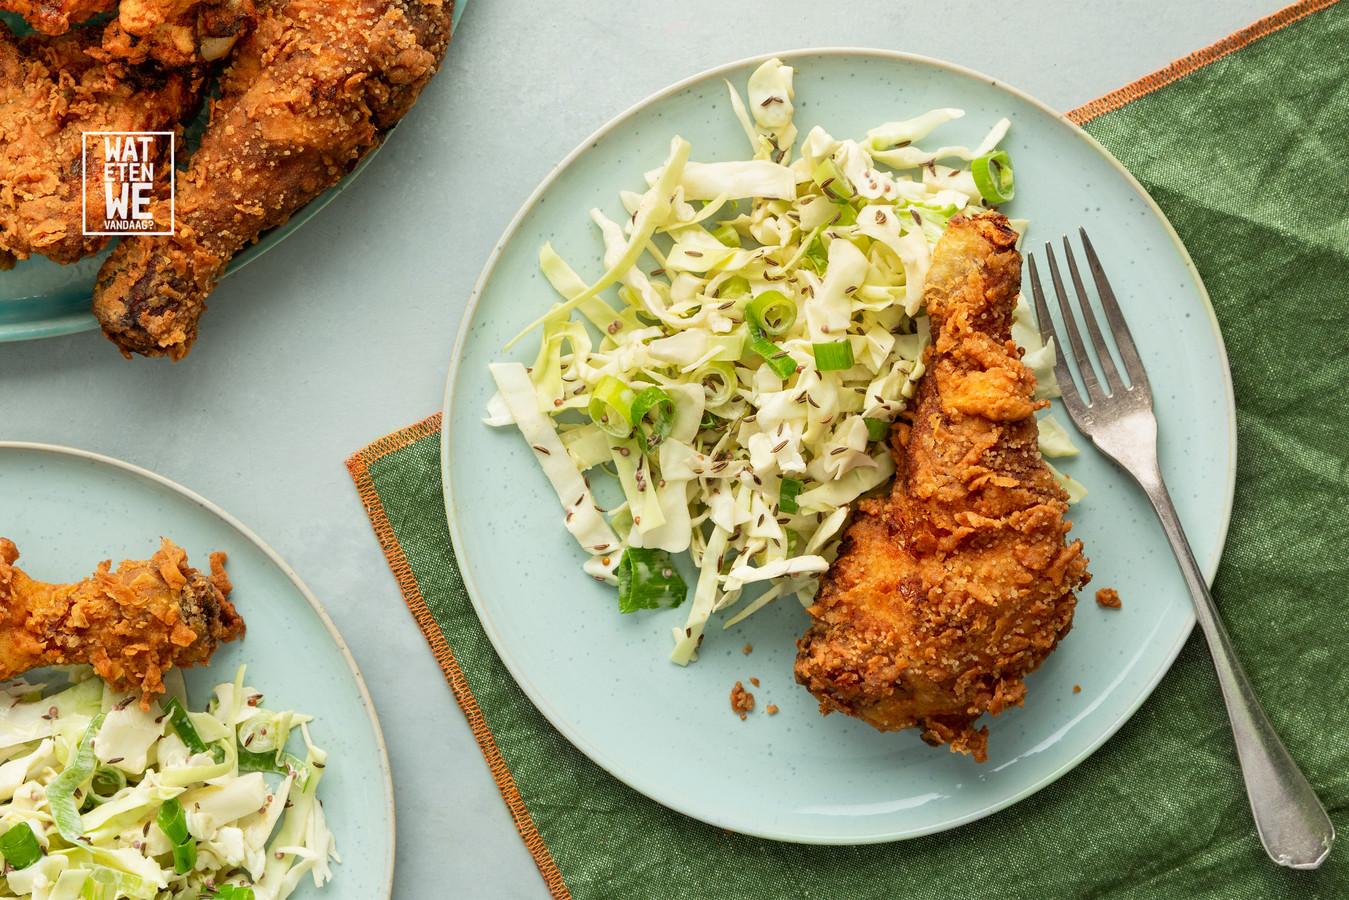 Fried chicken en coleslaw